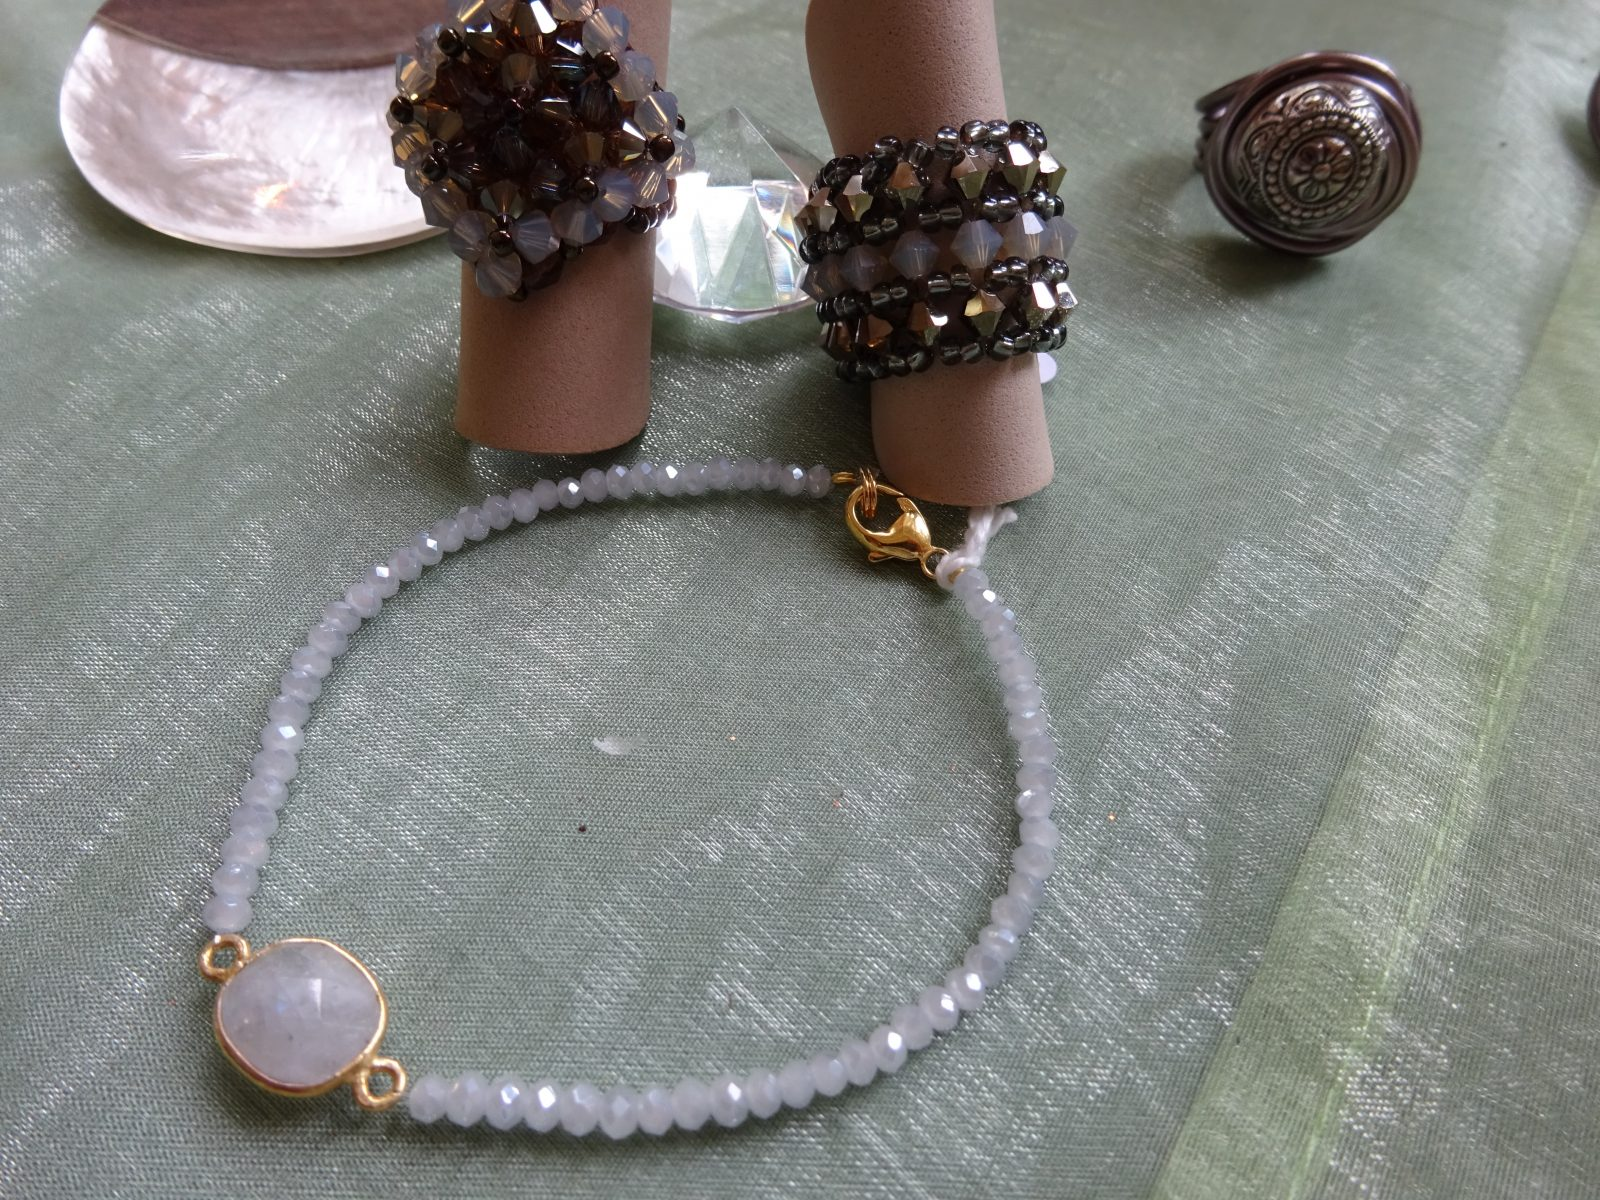 Armband, Swarovskiringe, taupe und opal